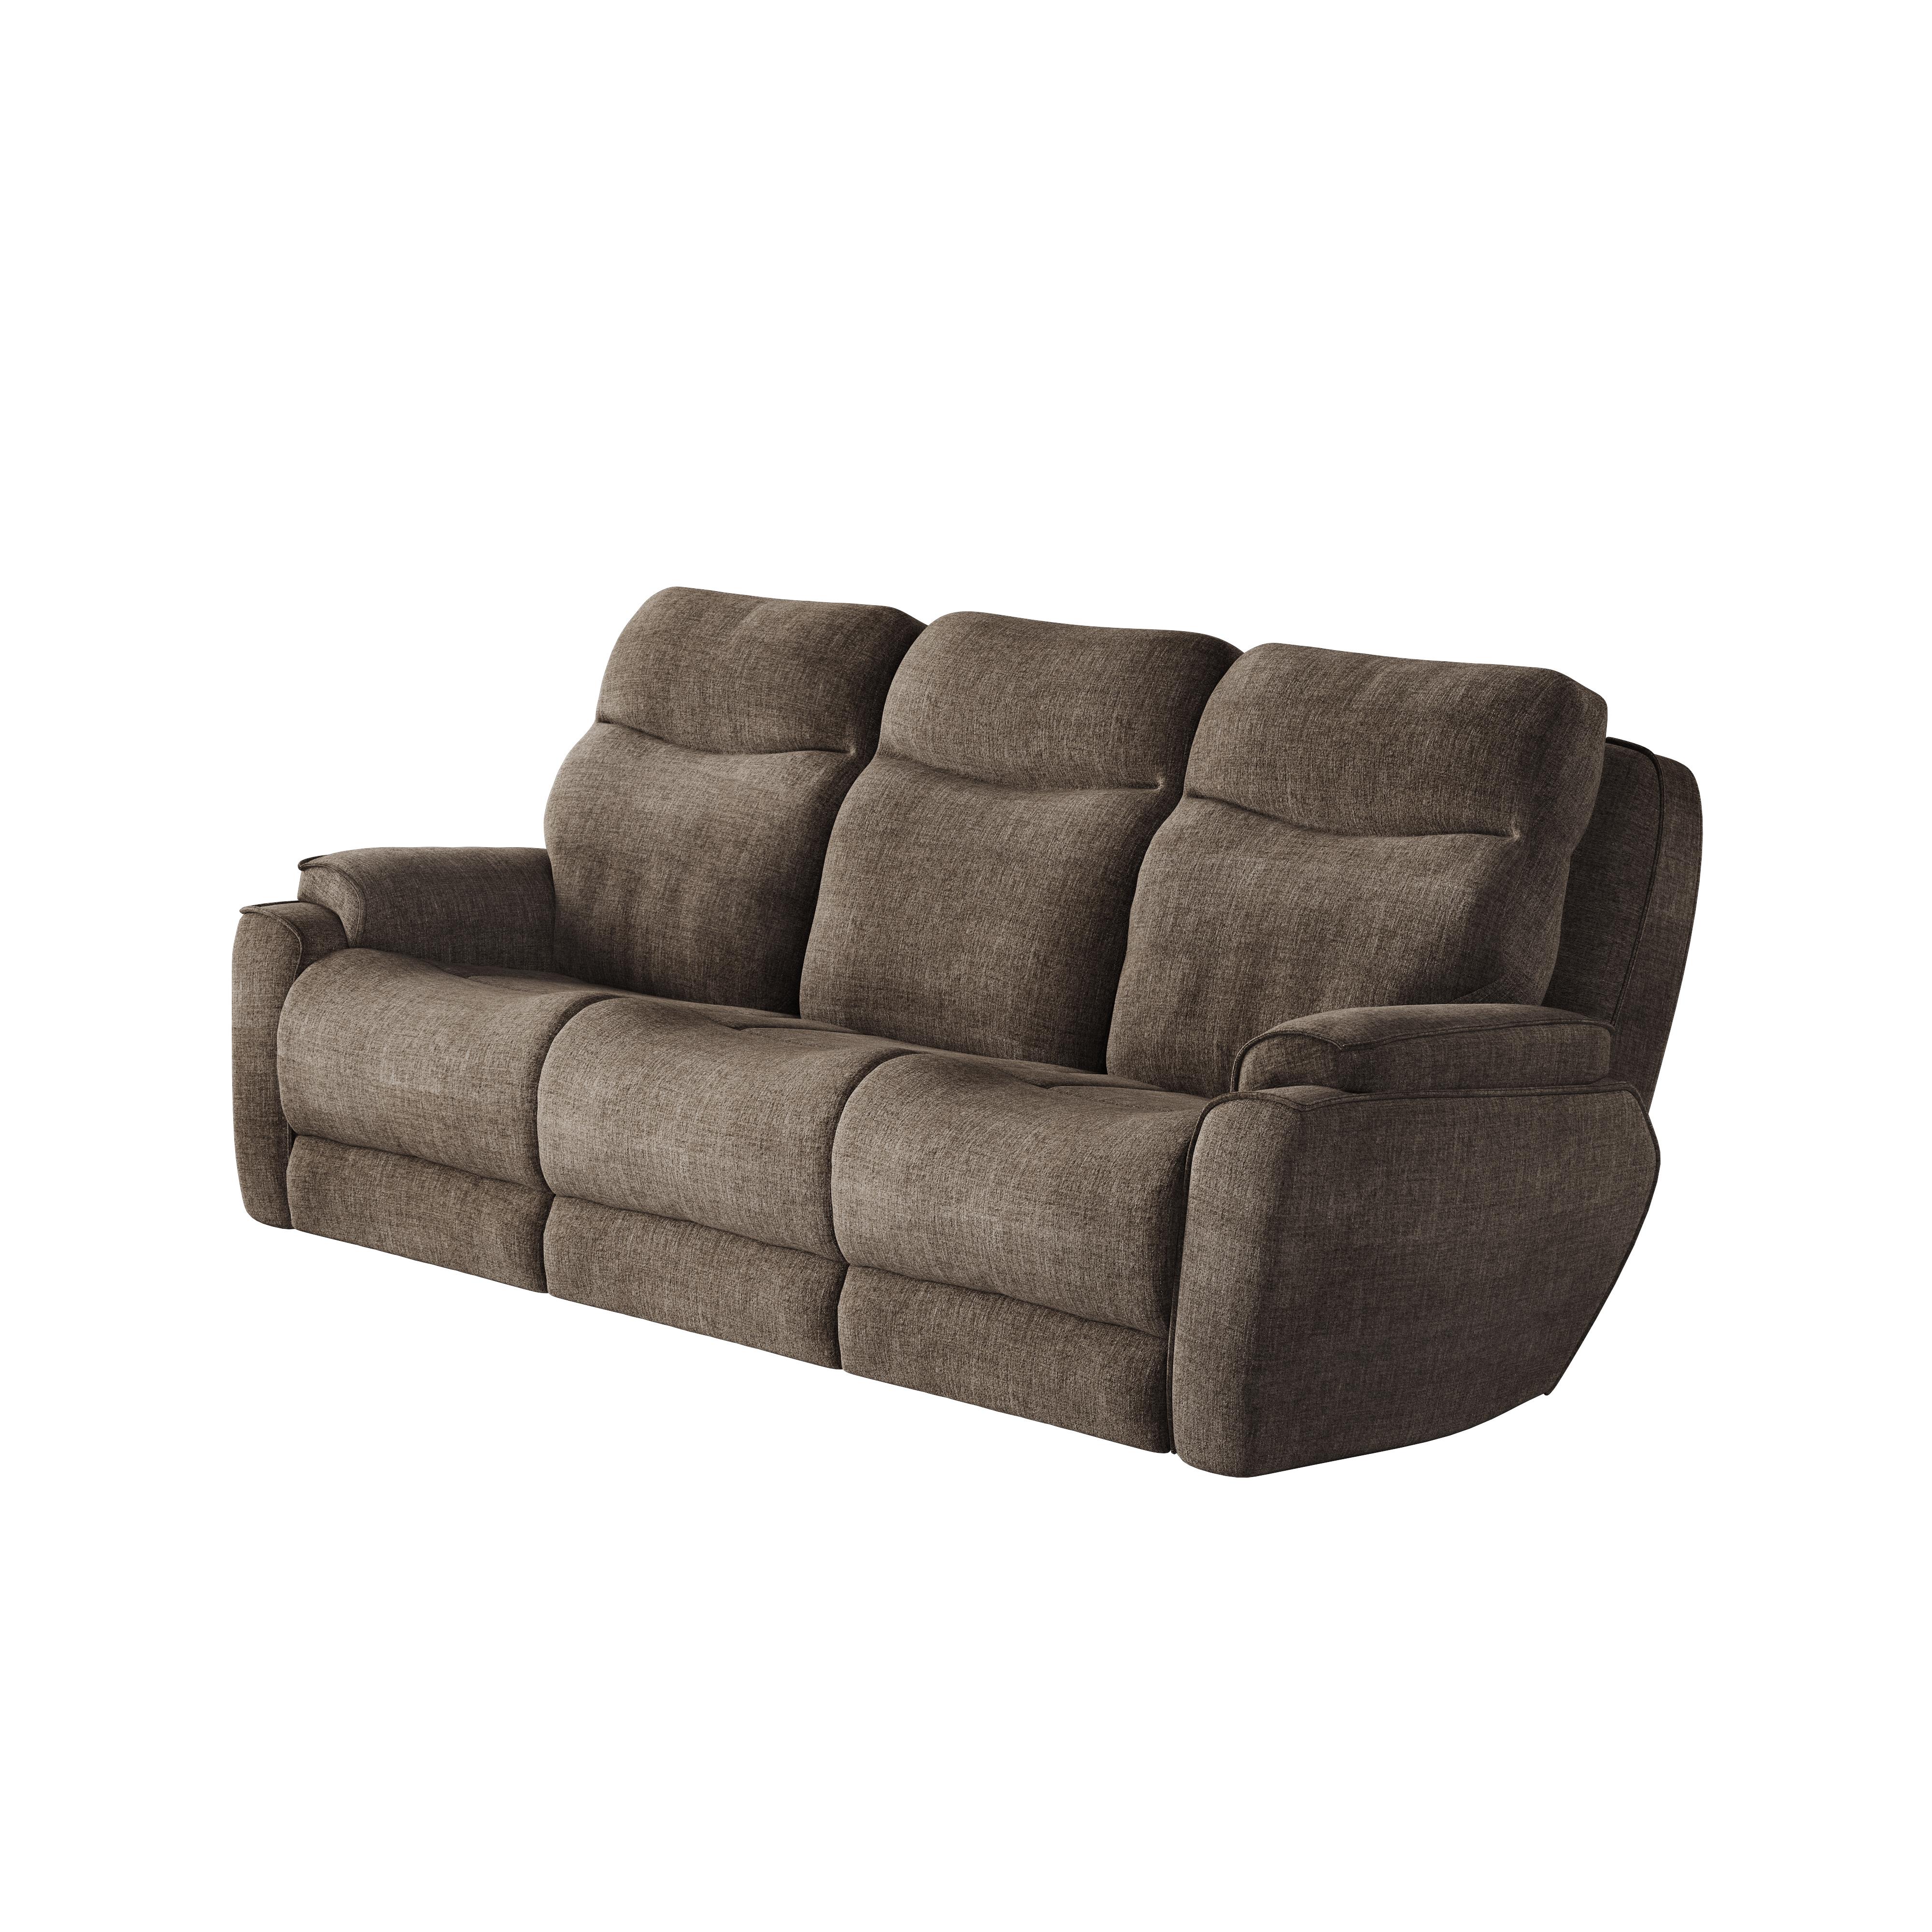 Bahari-Brindle-Sofa